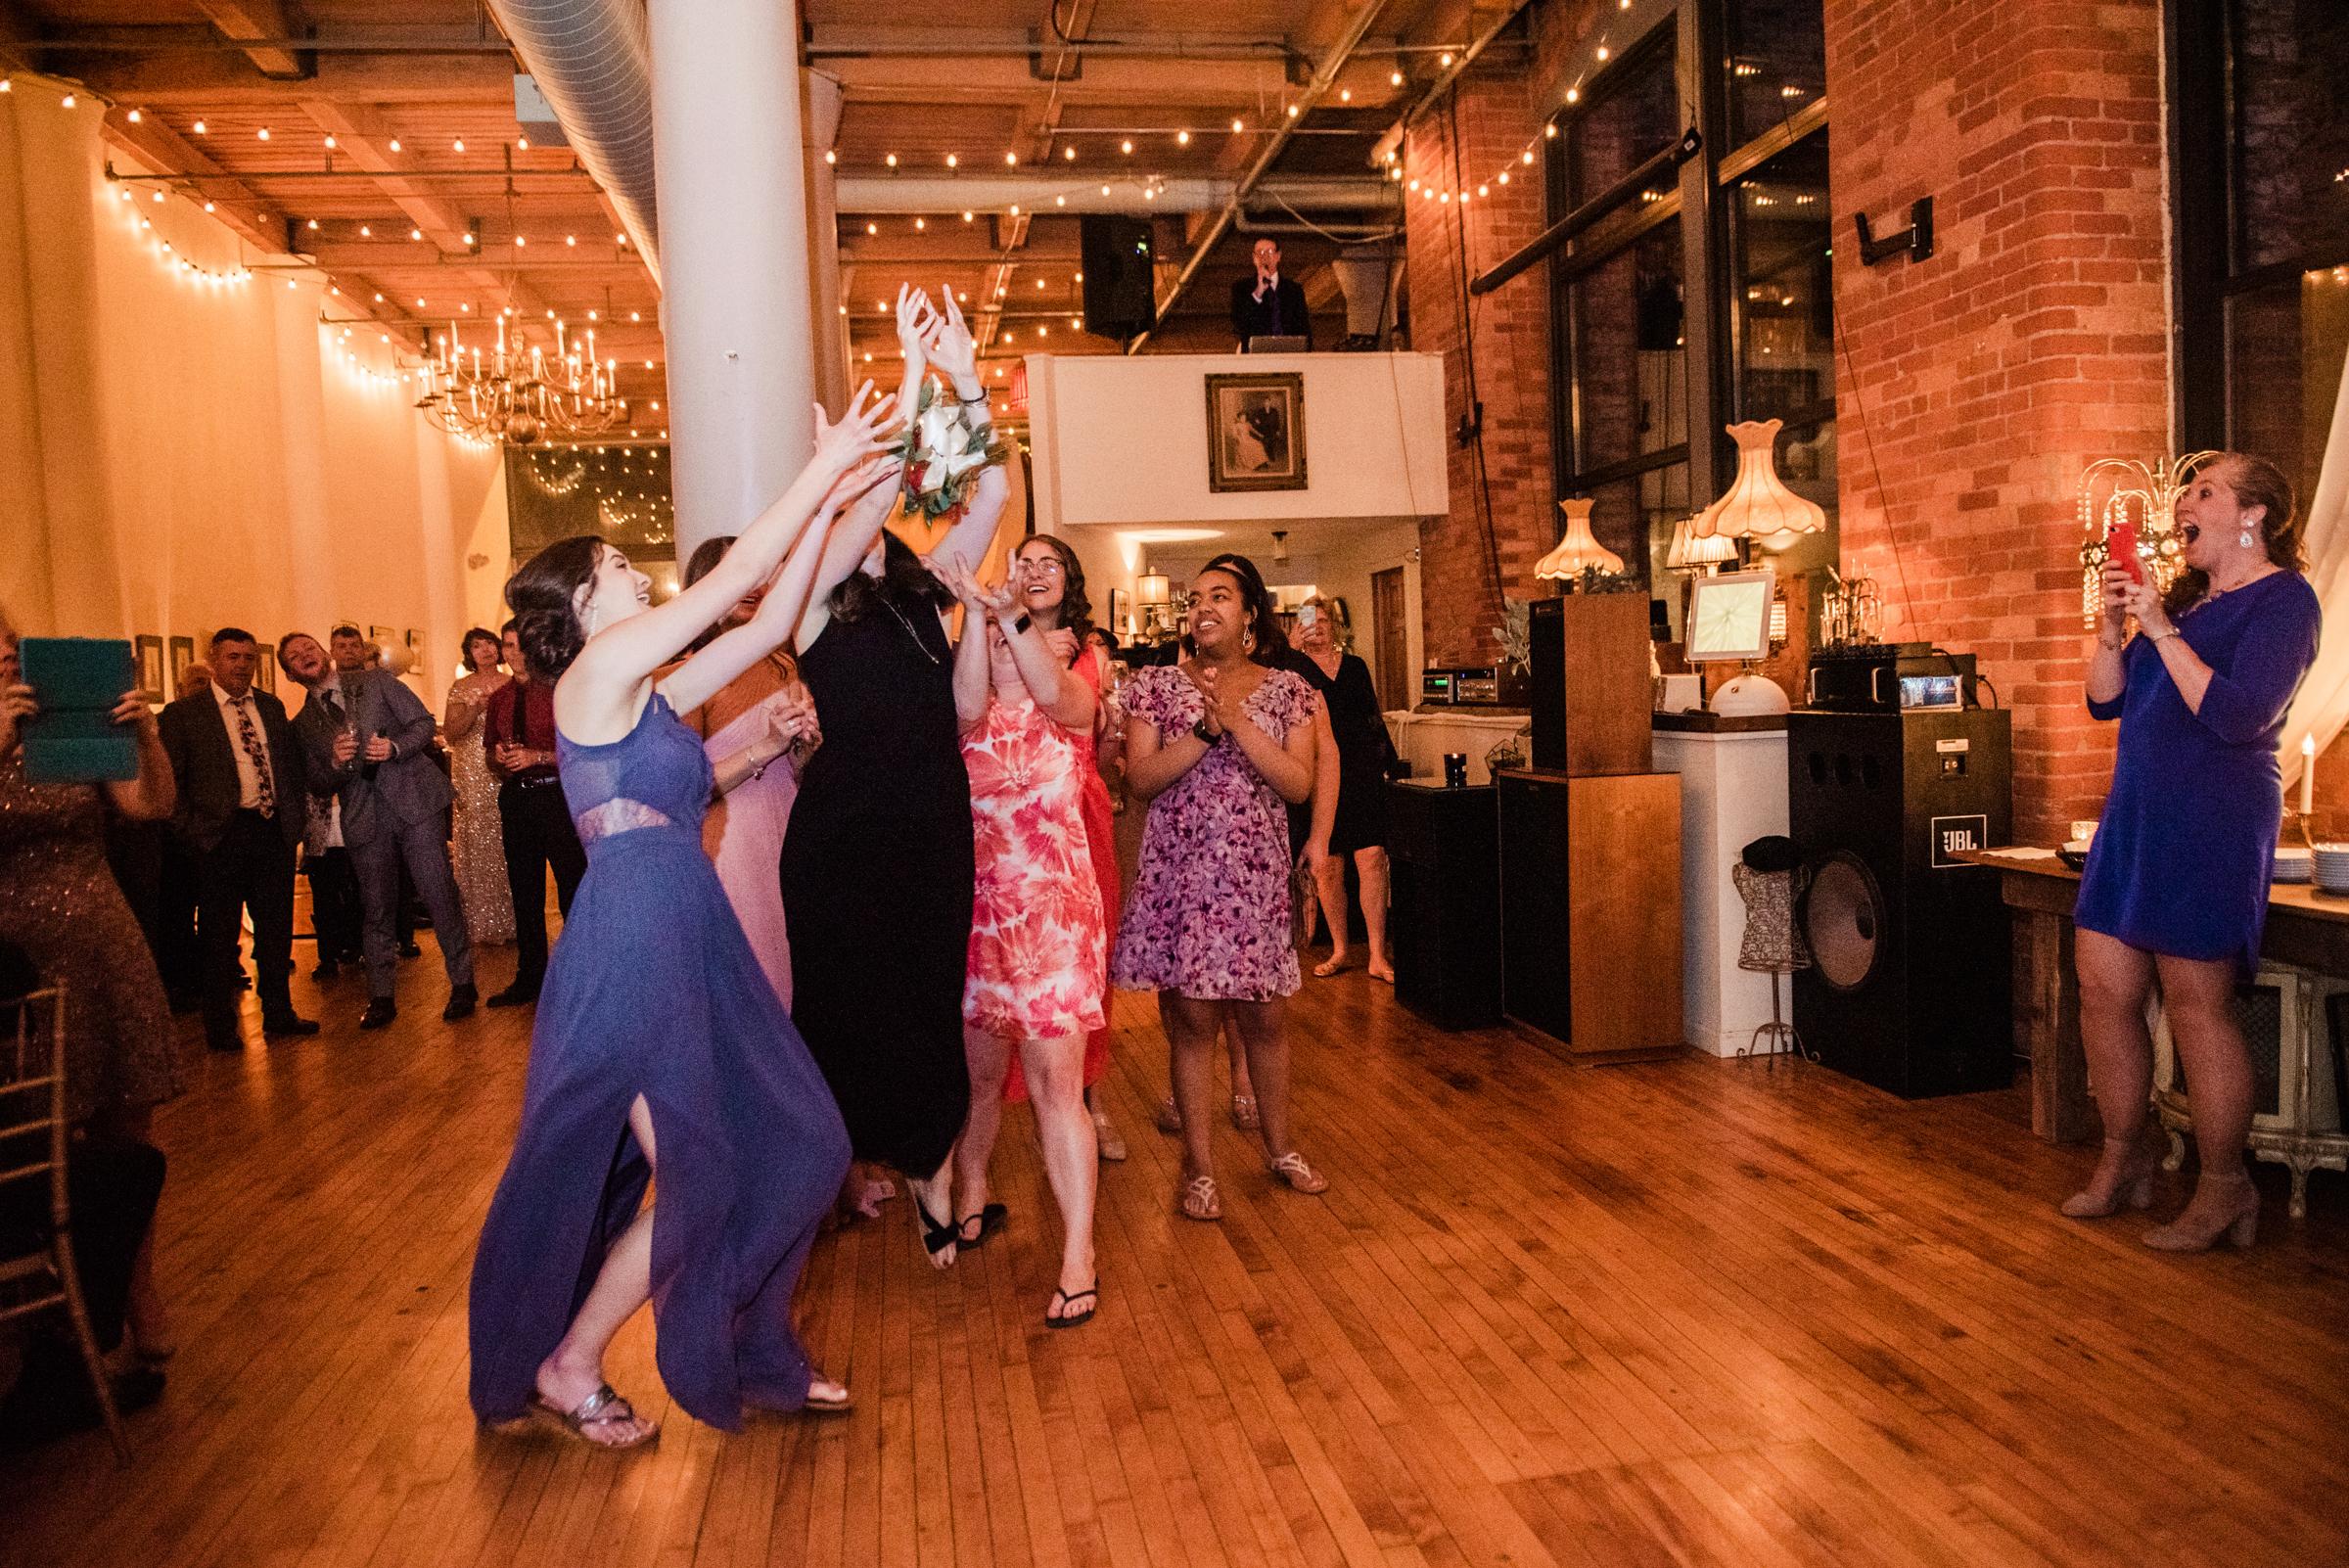 Studio_180_Lamberton_Conservatory_Rochester_Wedding_JILL_STUDIO_Rochester_NY_Photographer_DSC_9331.jpg